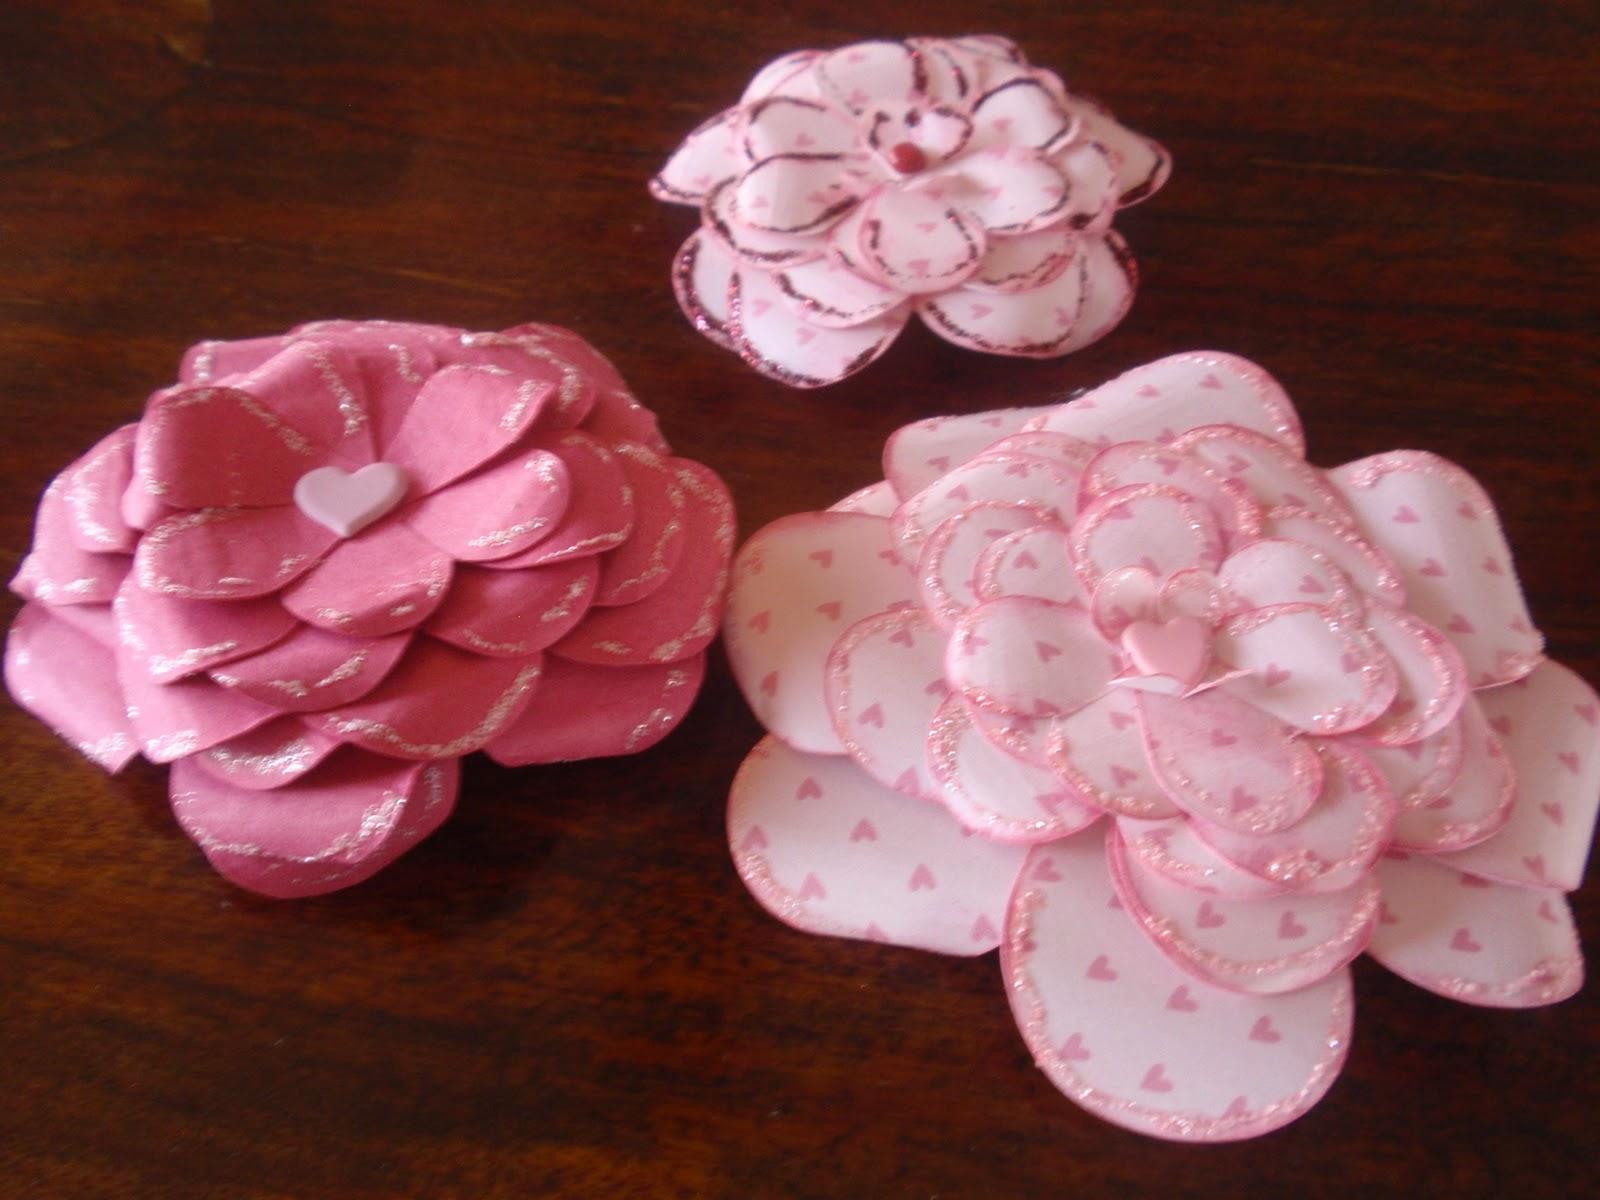 Sunshine memories how to make pretty paper roses out of heart shapes how to make pretty paper roses out of heart shapes mightylinksfo Images